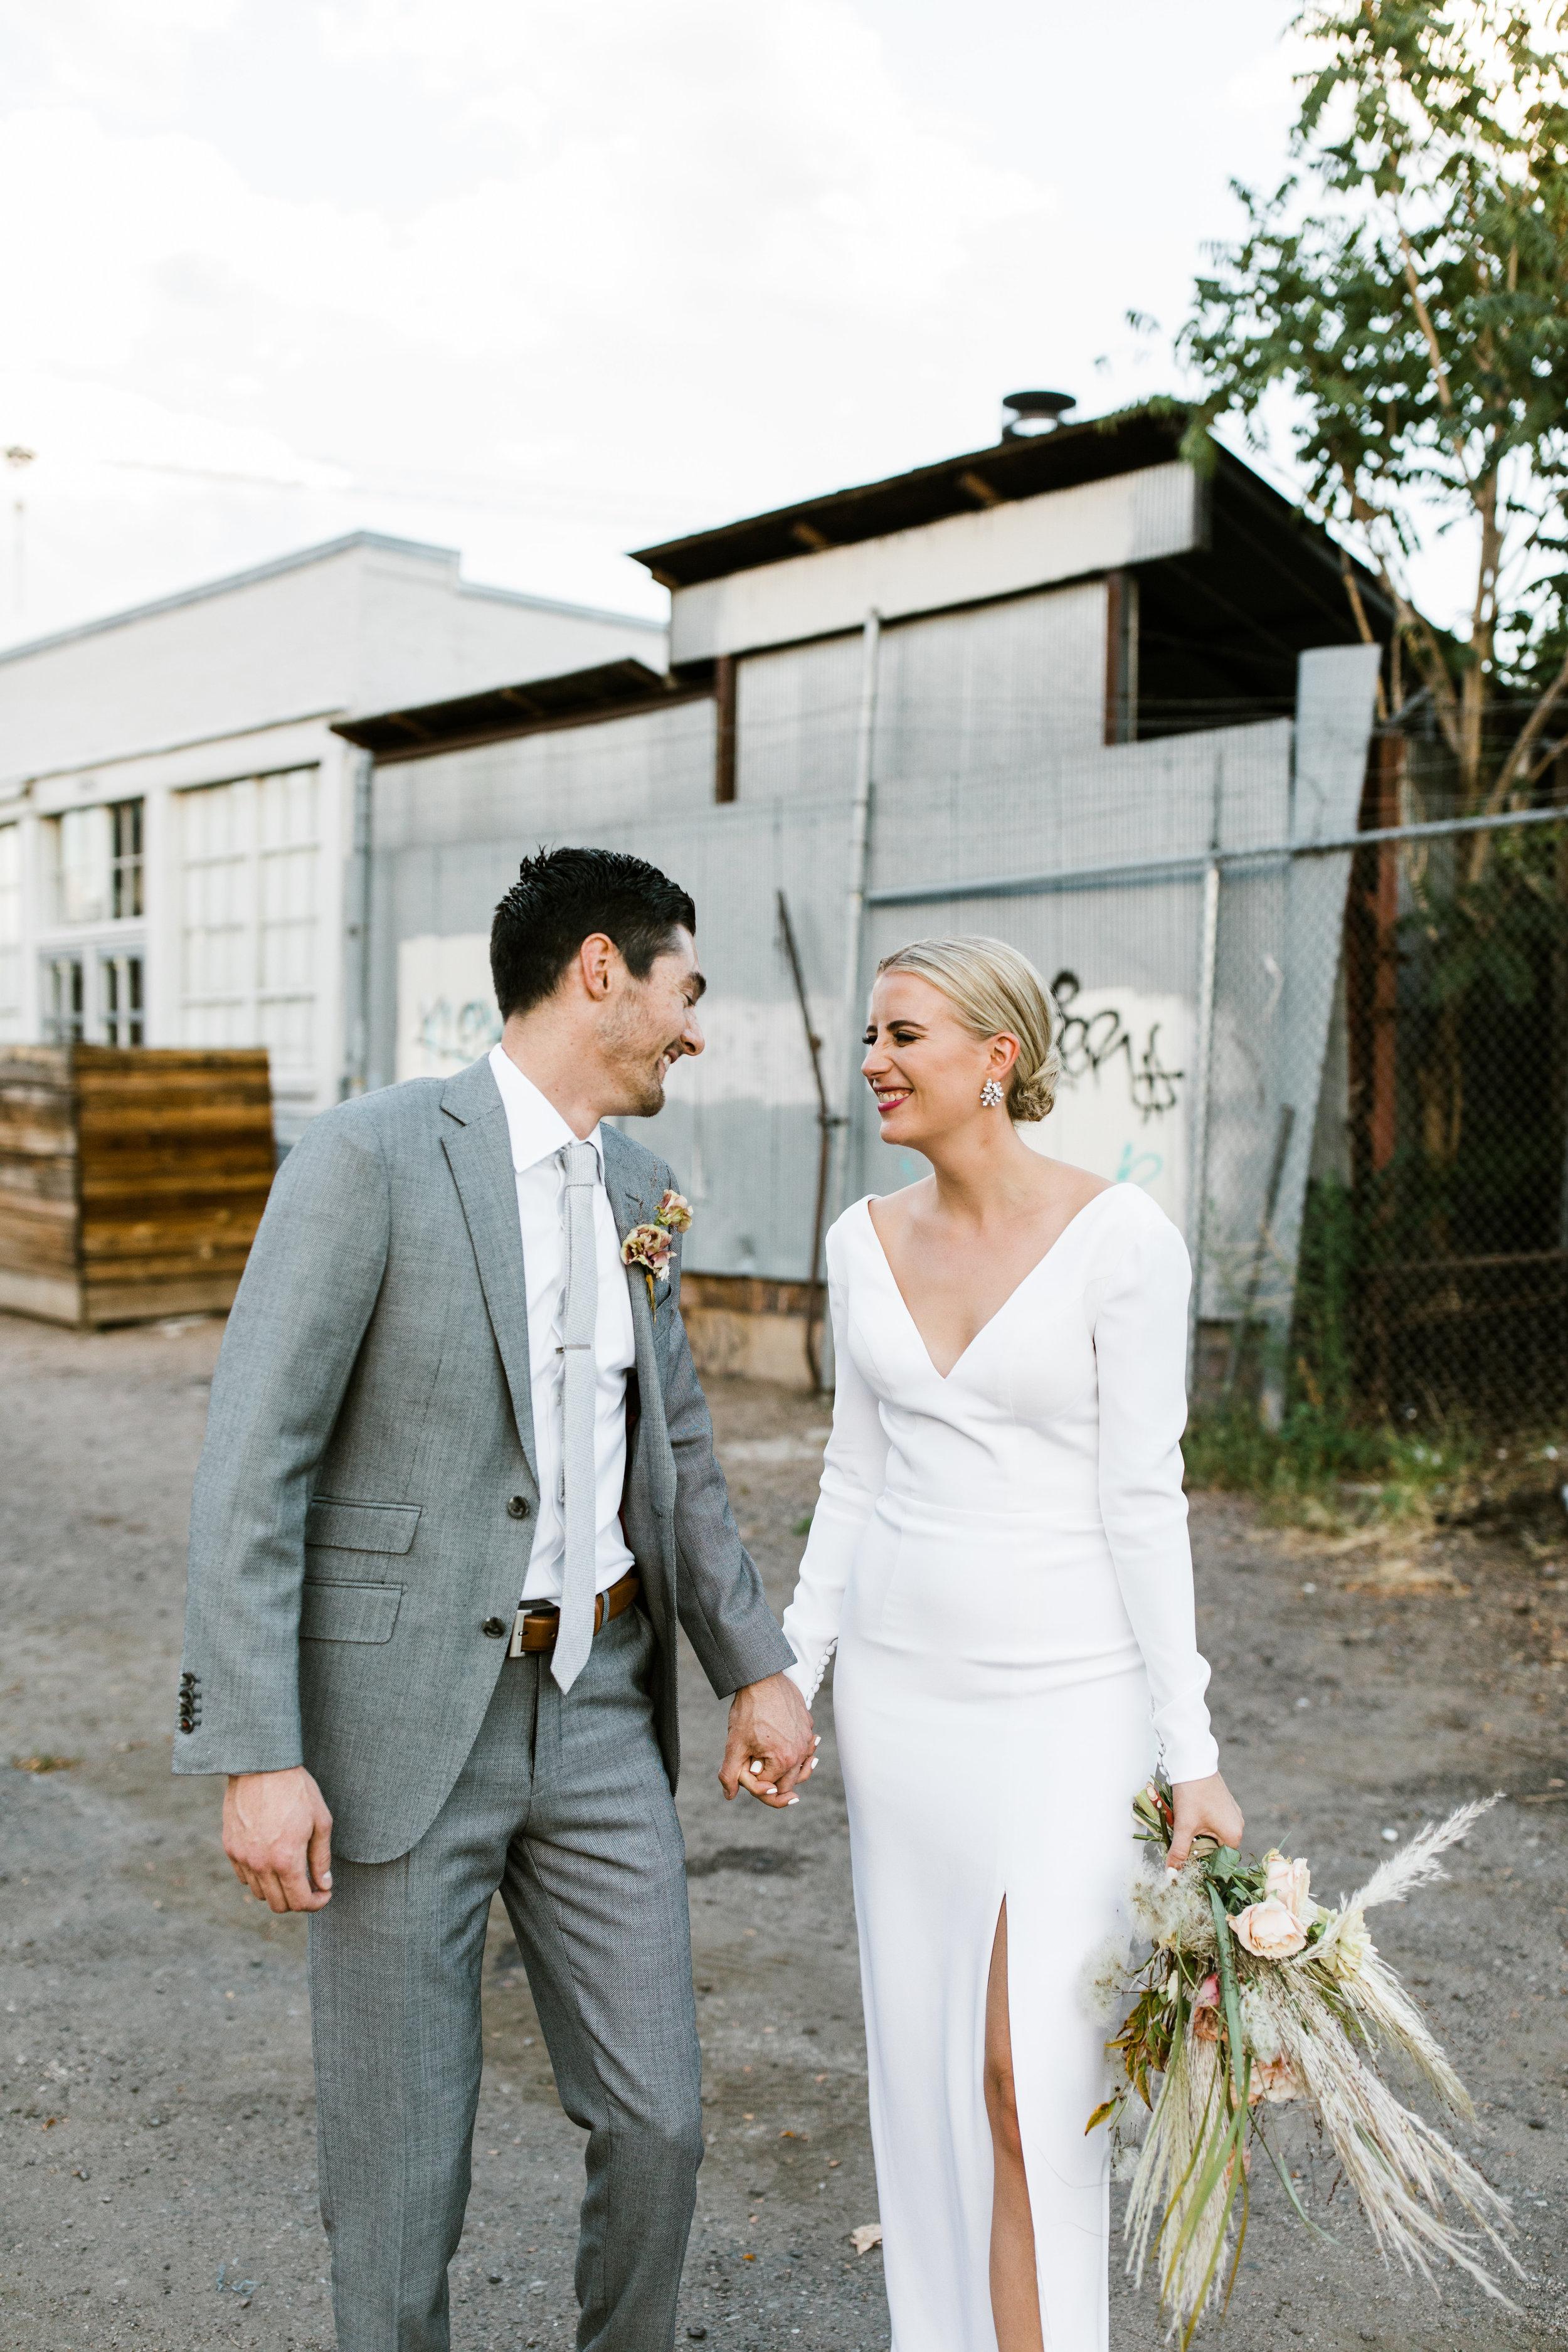 amykyle-wedding-0448.jpg